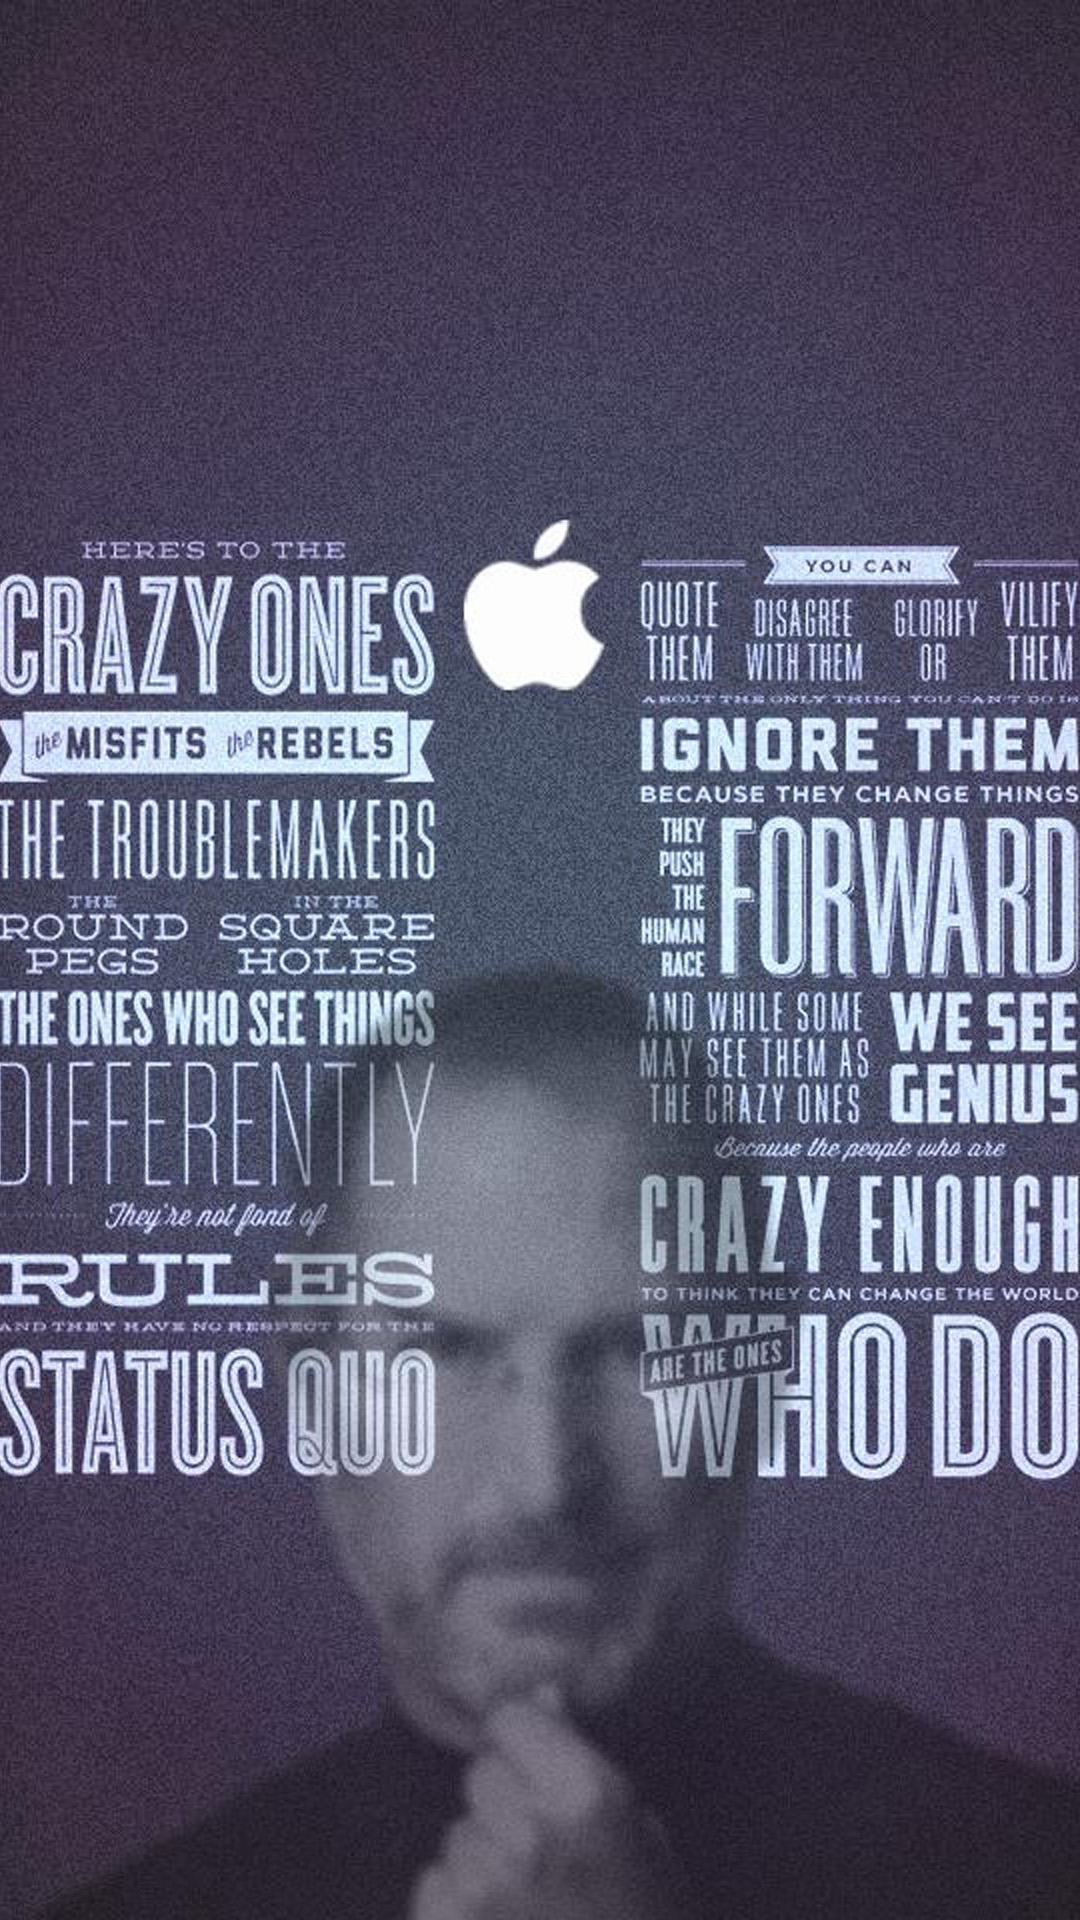 Steve Jobs Quotes Wallpaper For Iphone - HD Wallpaper